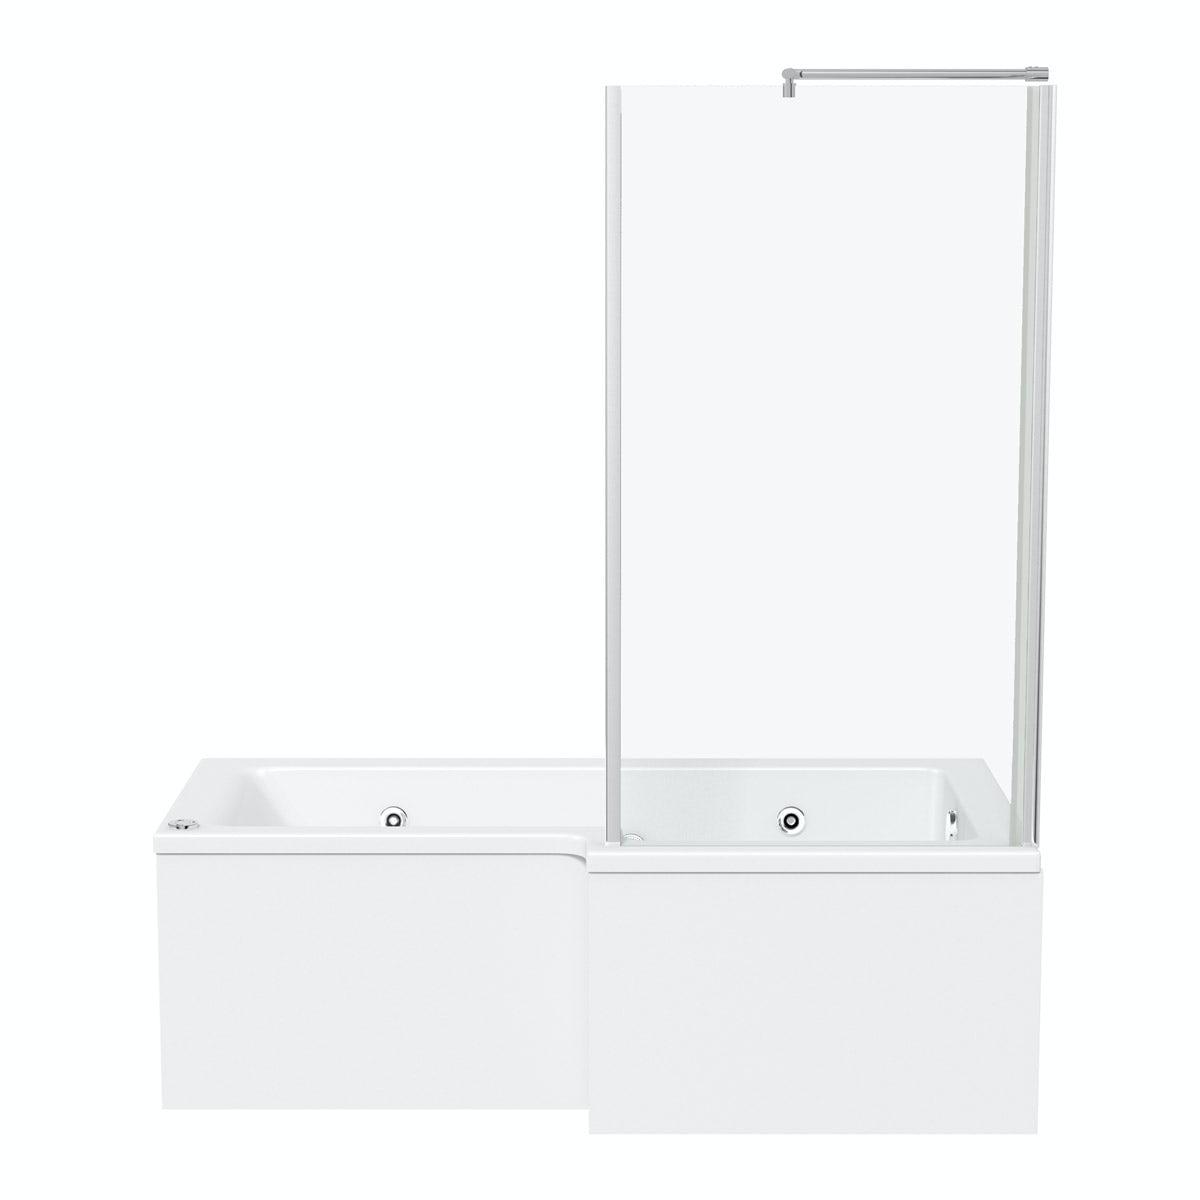 L Shaped Whirlpool Shower Bath L Shaped Right Handed 12 Jet Whirlpool Shower Bath With